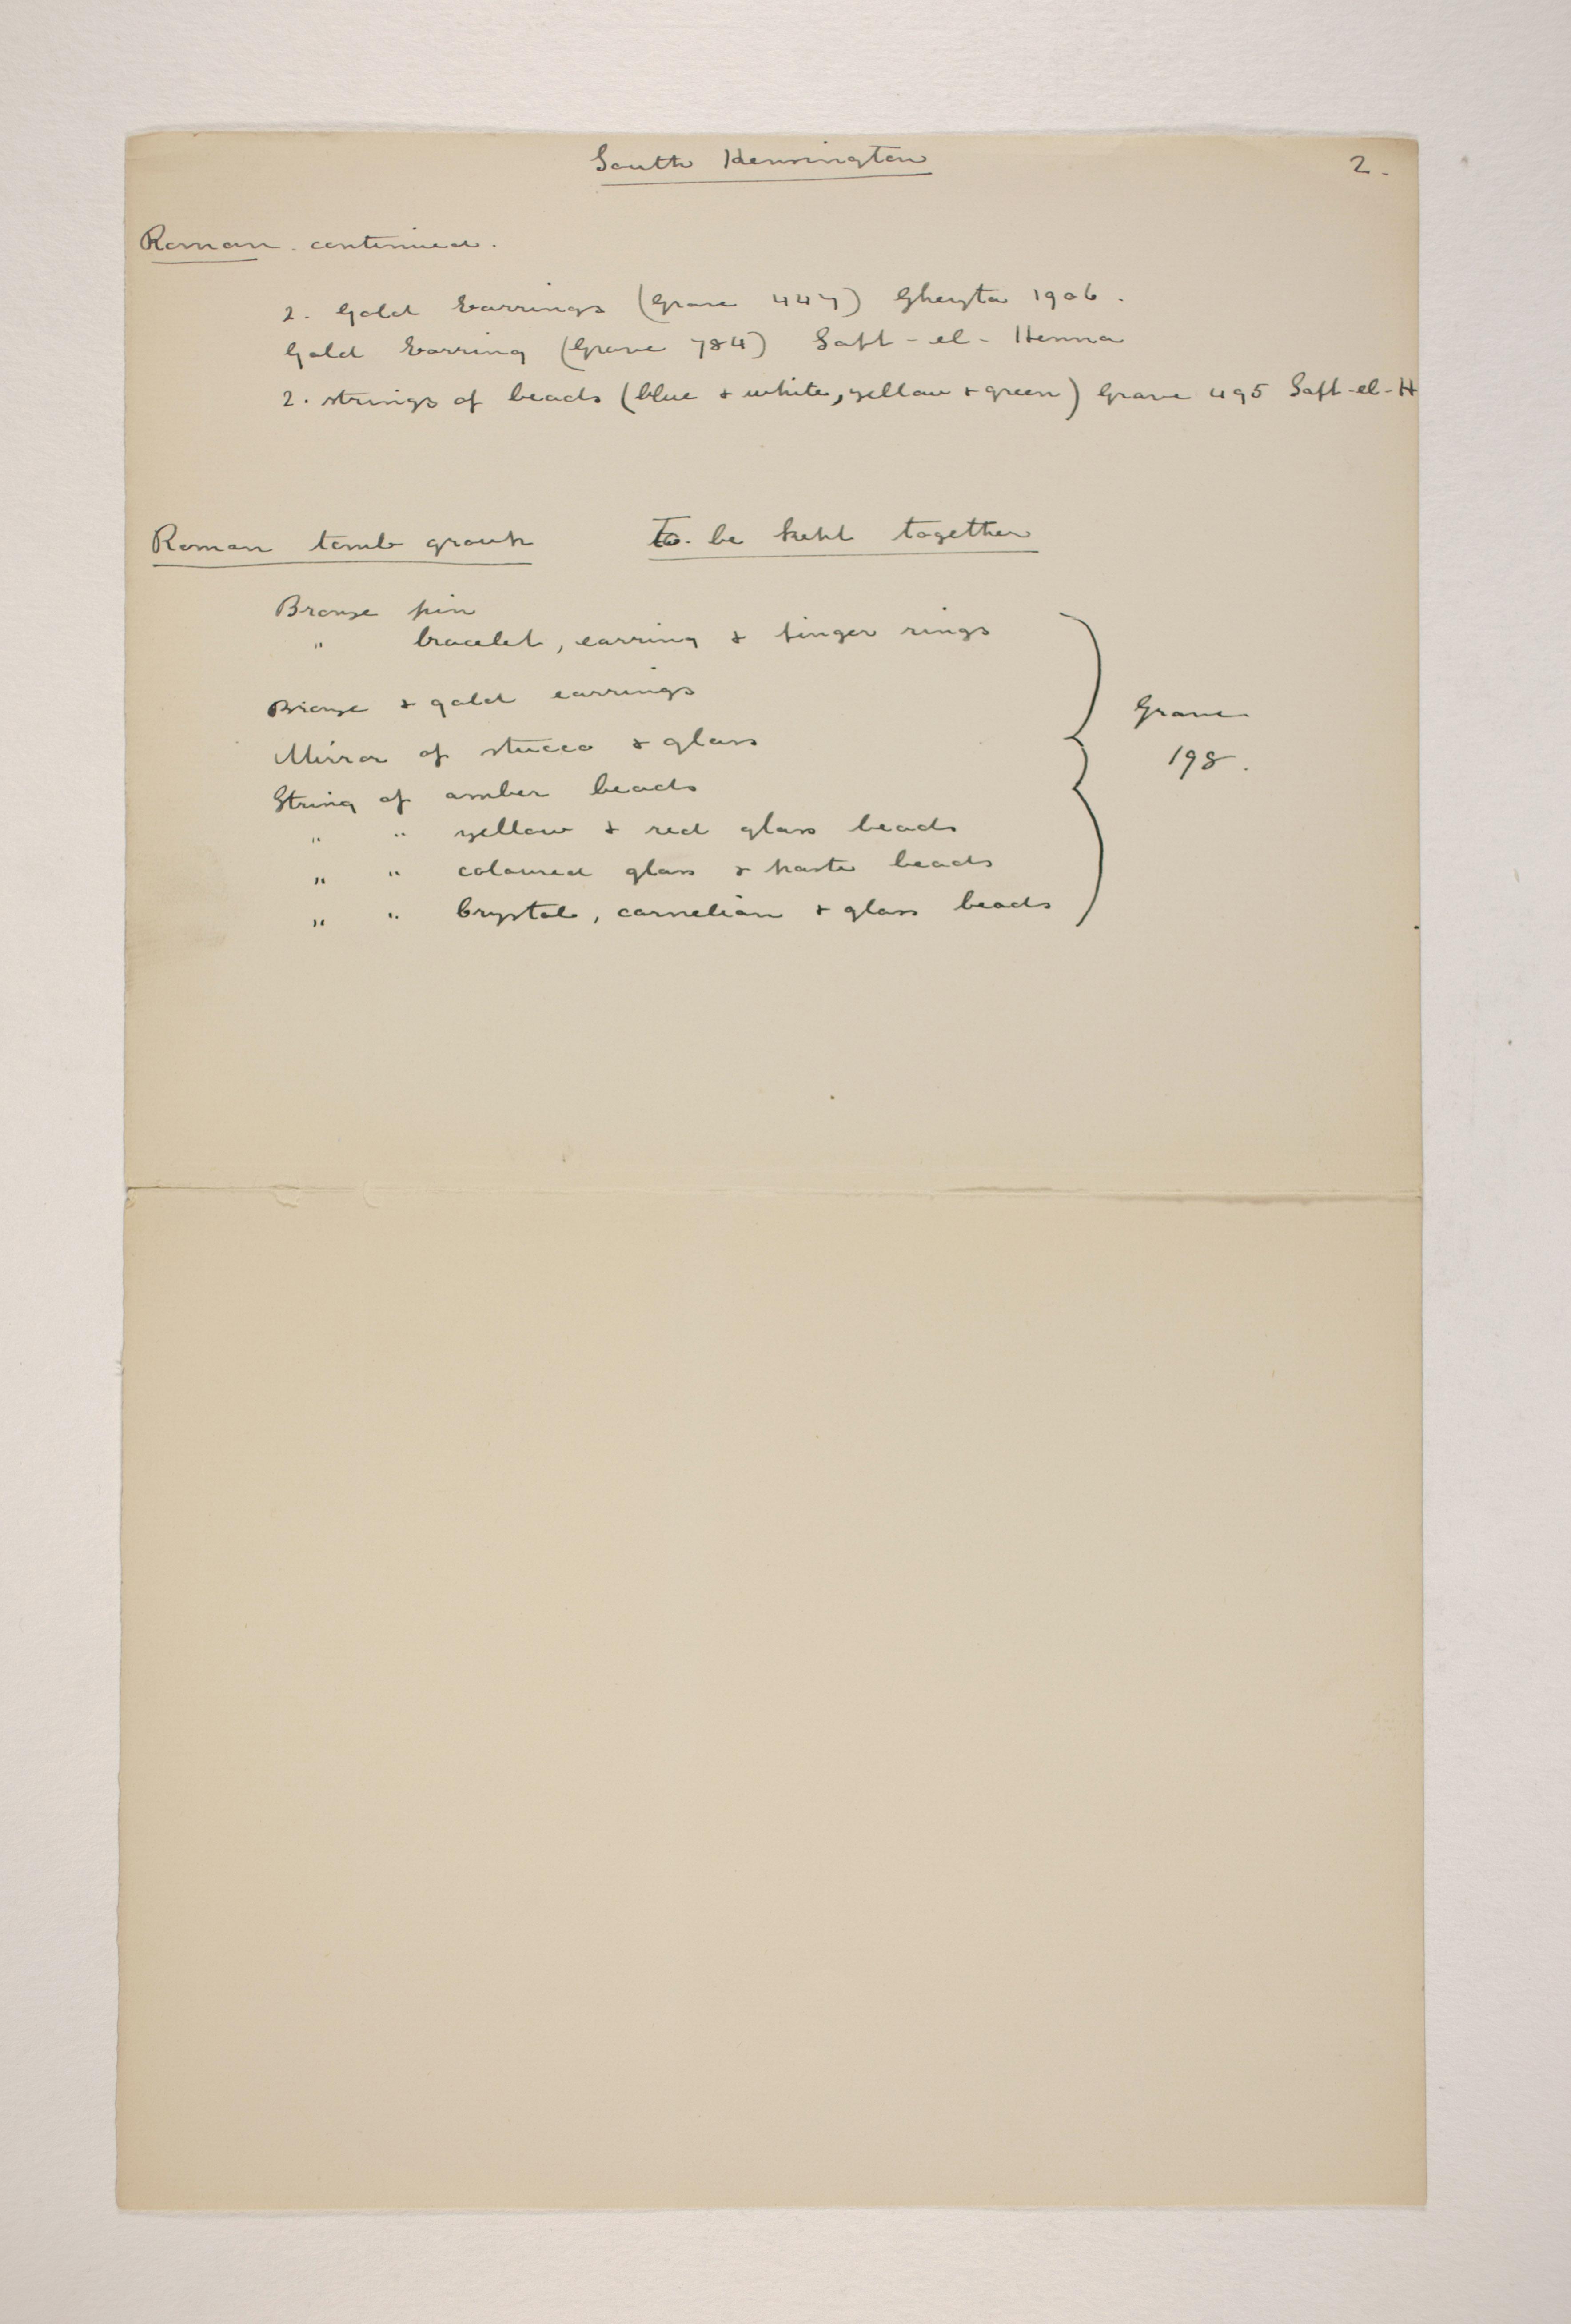 1905-06 Eastern Delta: Belbeis, Tell el-Rataba, Saft el-Hinna, Tell el-Yahudiya, Shaghanbeh, Ghita Individual institution list  PMA/WFP1/D/14/15.2